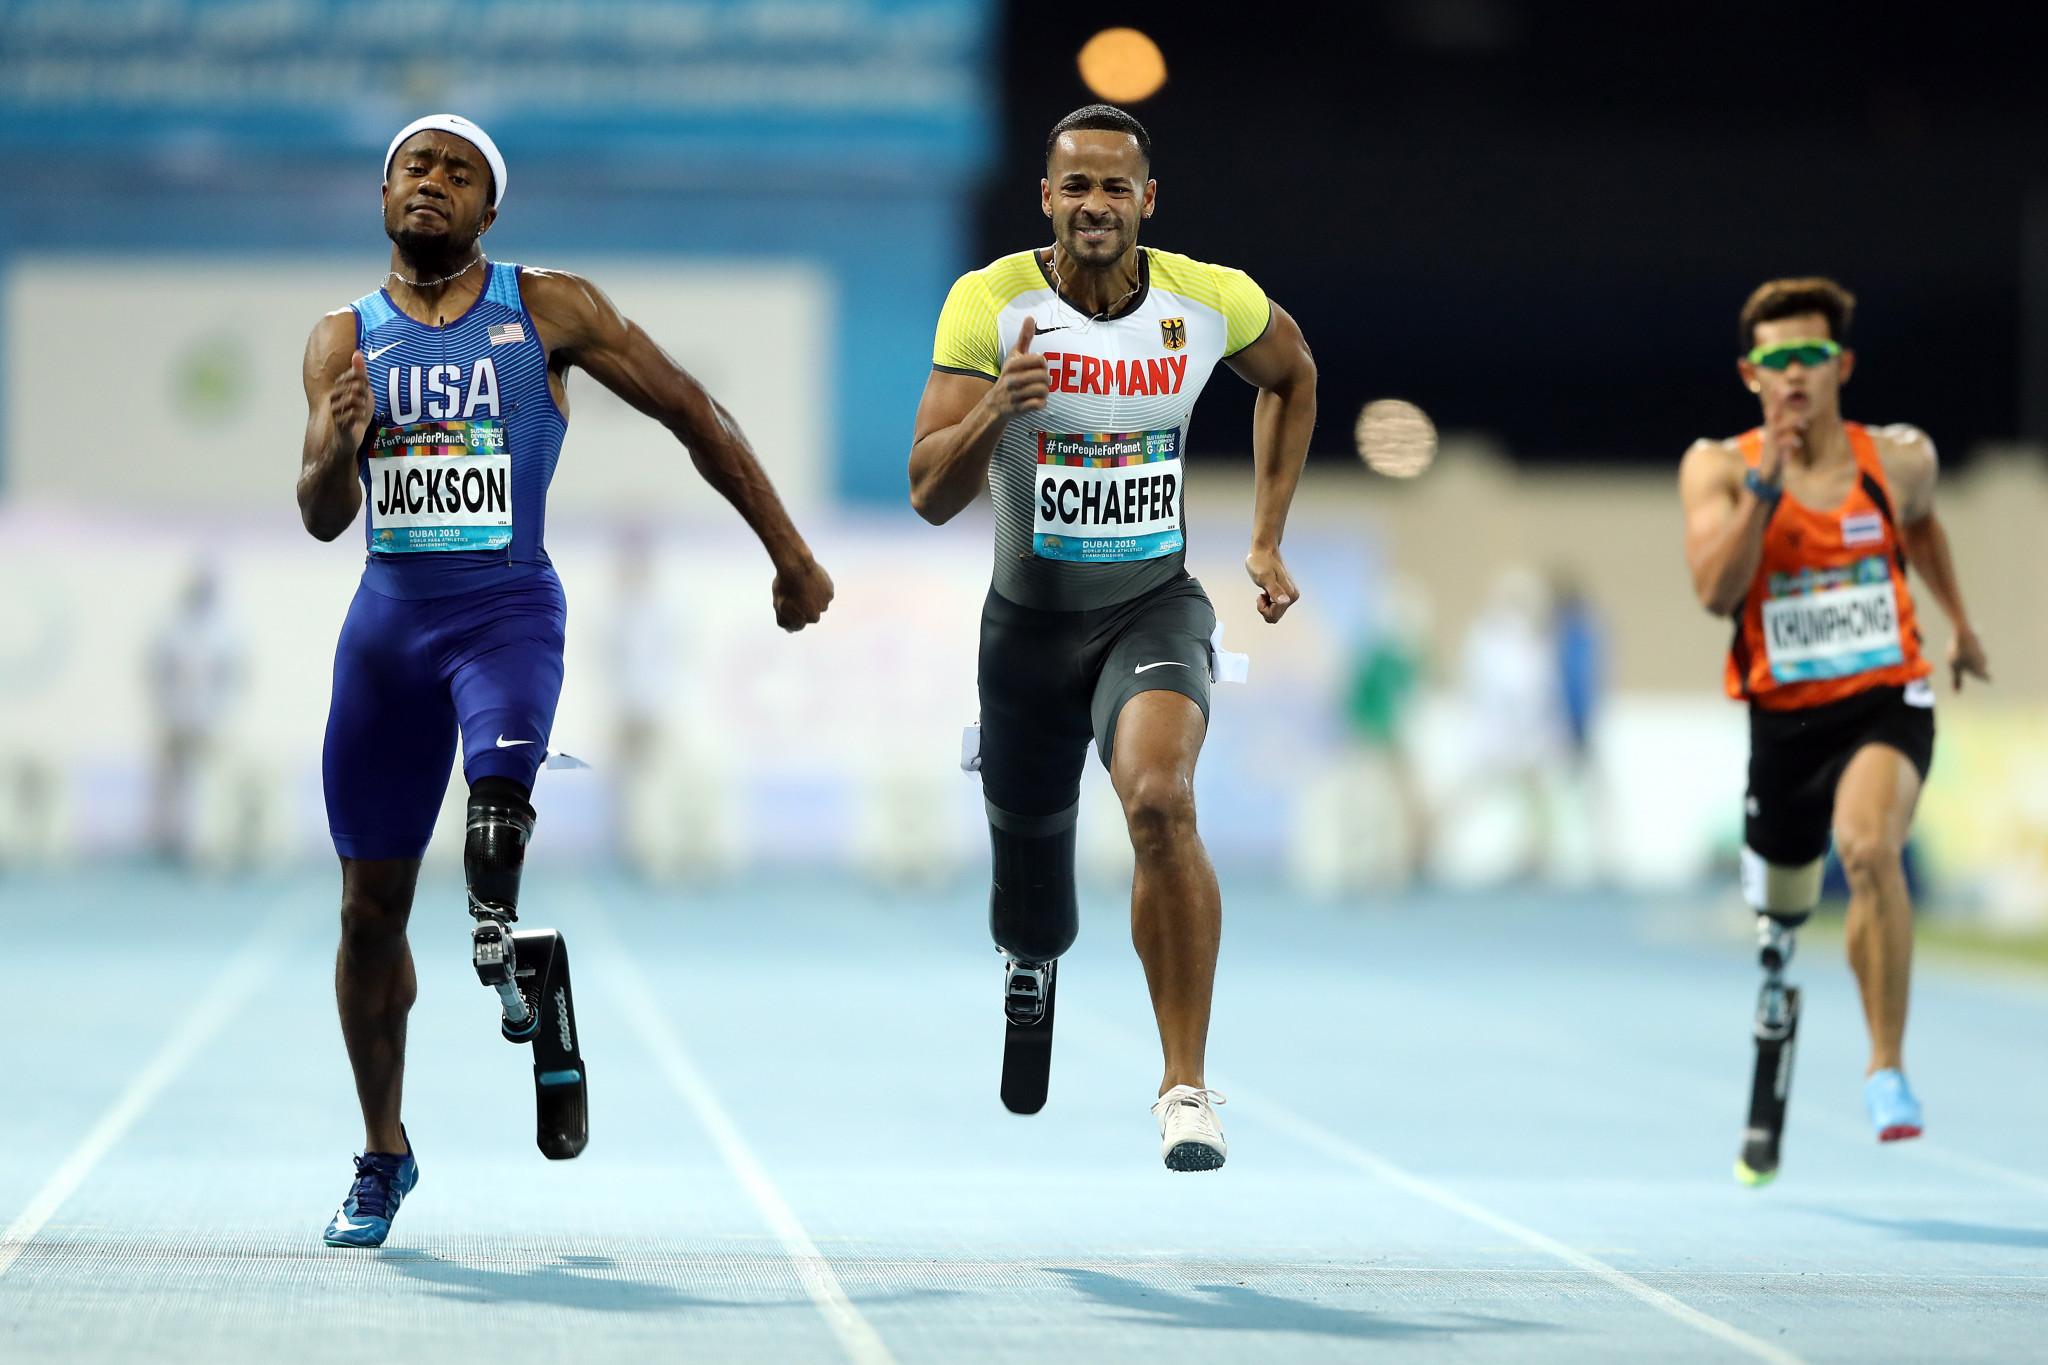 World Para Athletics announces provisional calendar for 2021 season